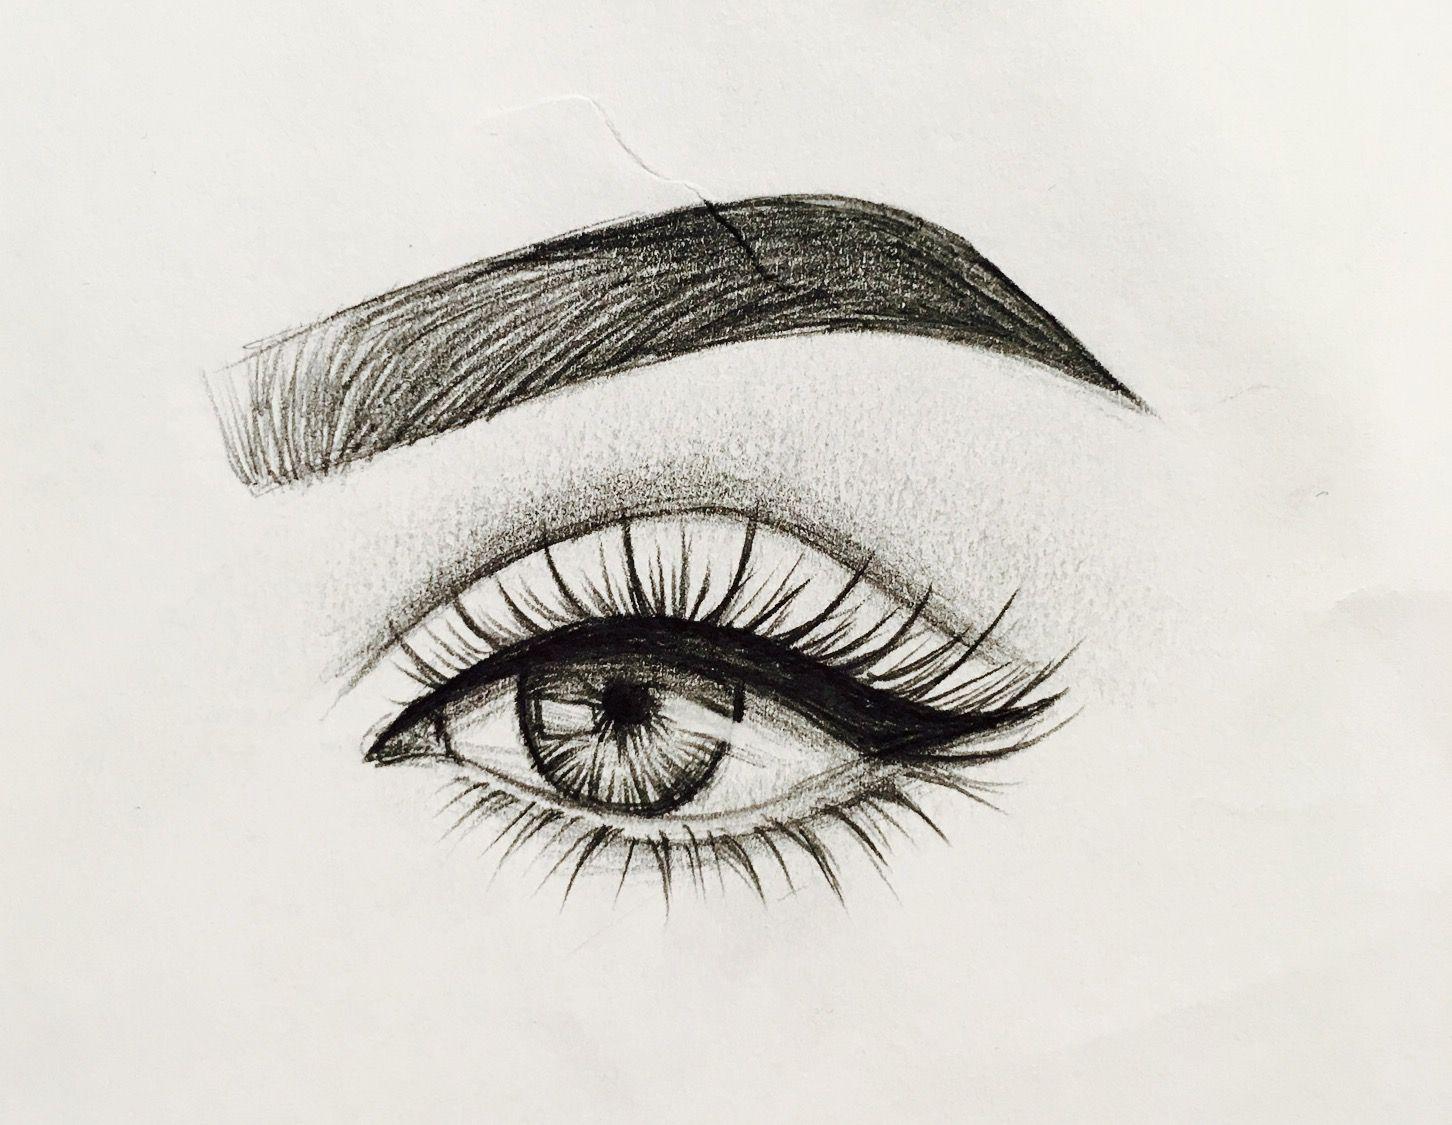 Idea by Emmie 🤷 on drawings ideas Art sketches, Eye